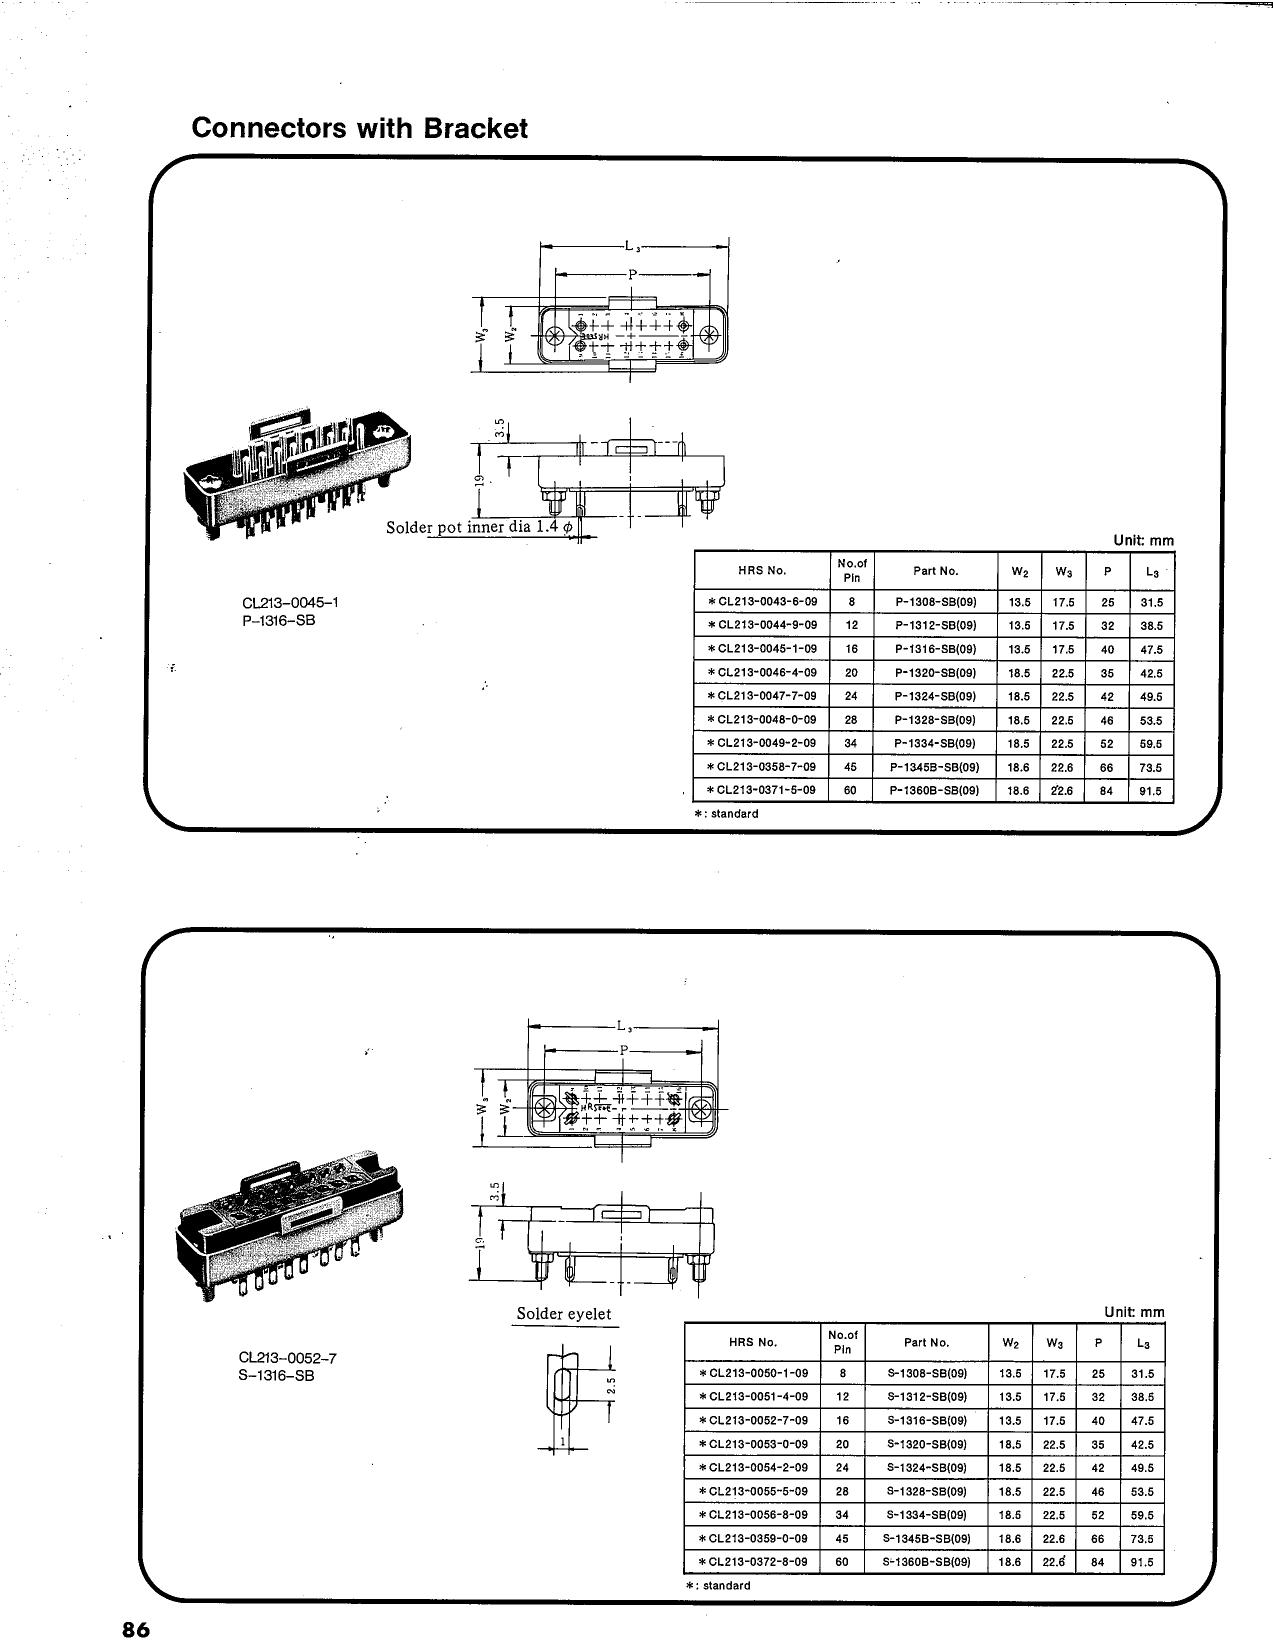 S-1328-H pdf